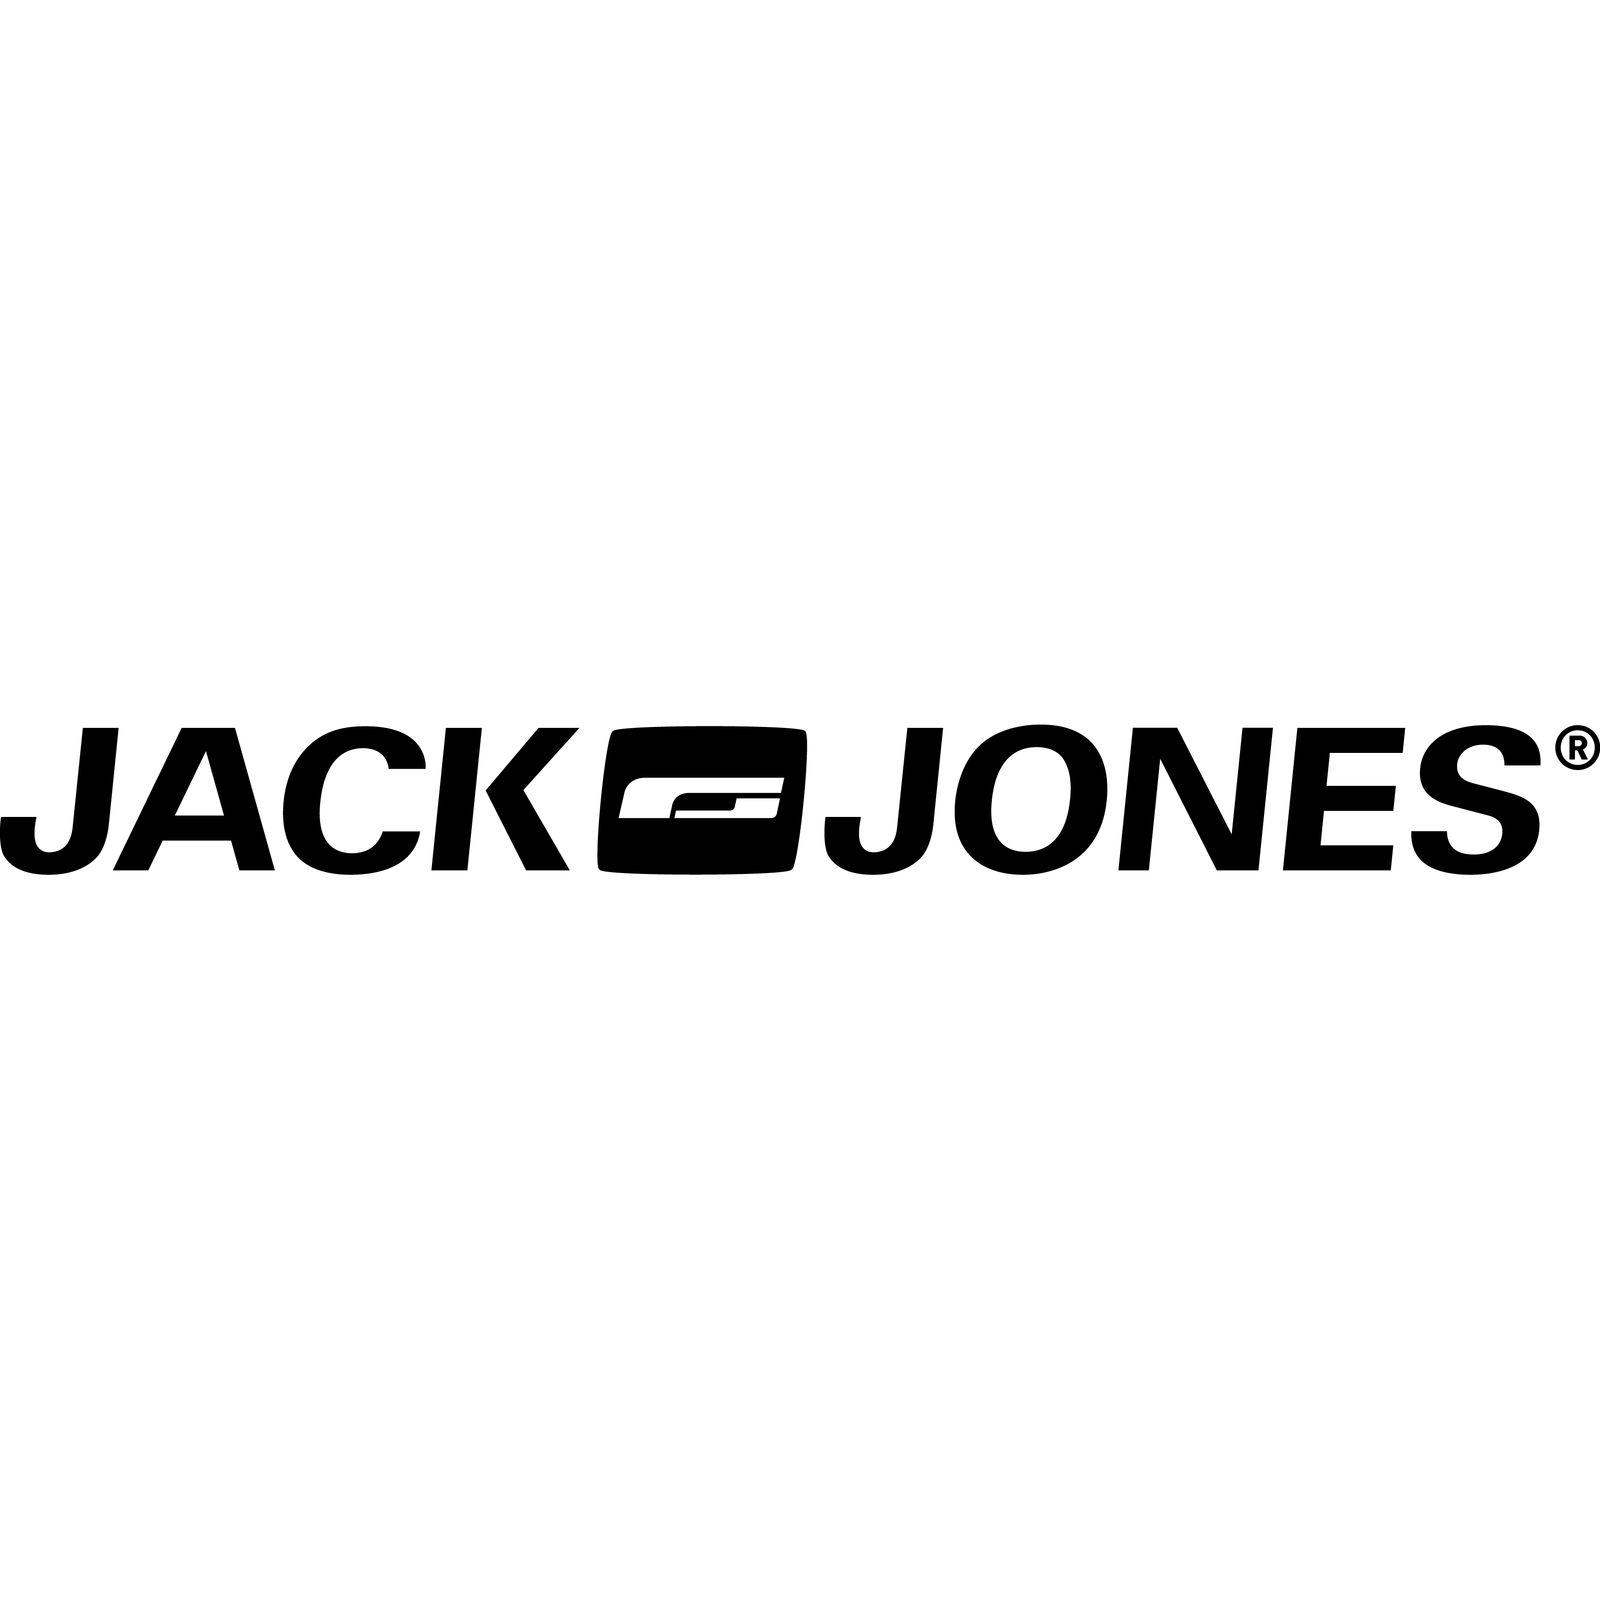 JACK & JONES (Image 1)